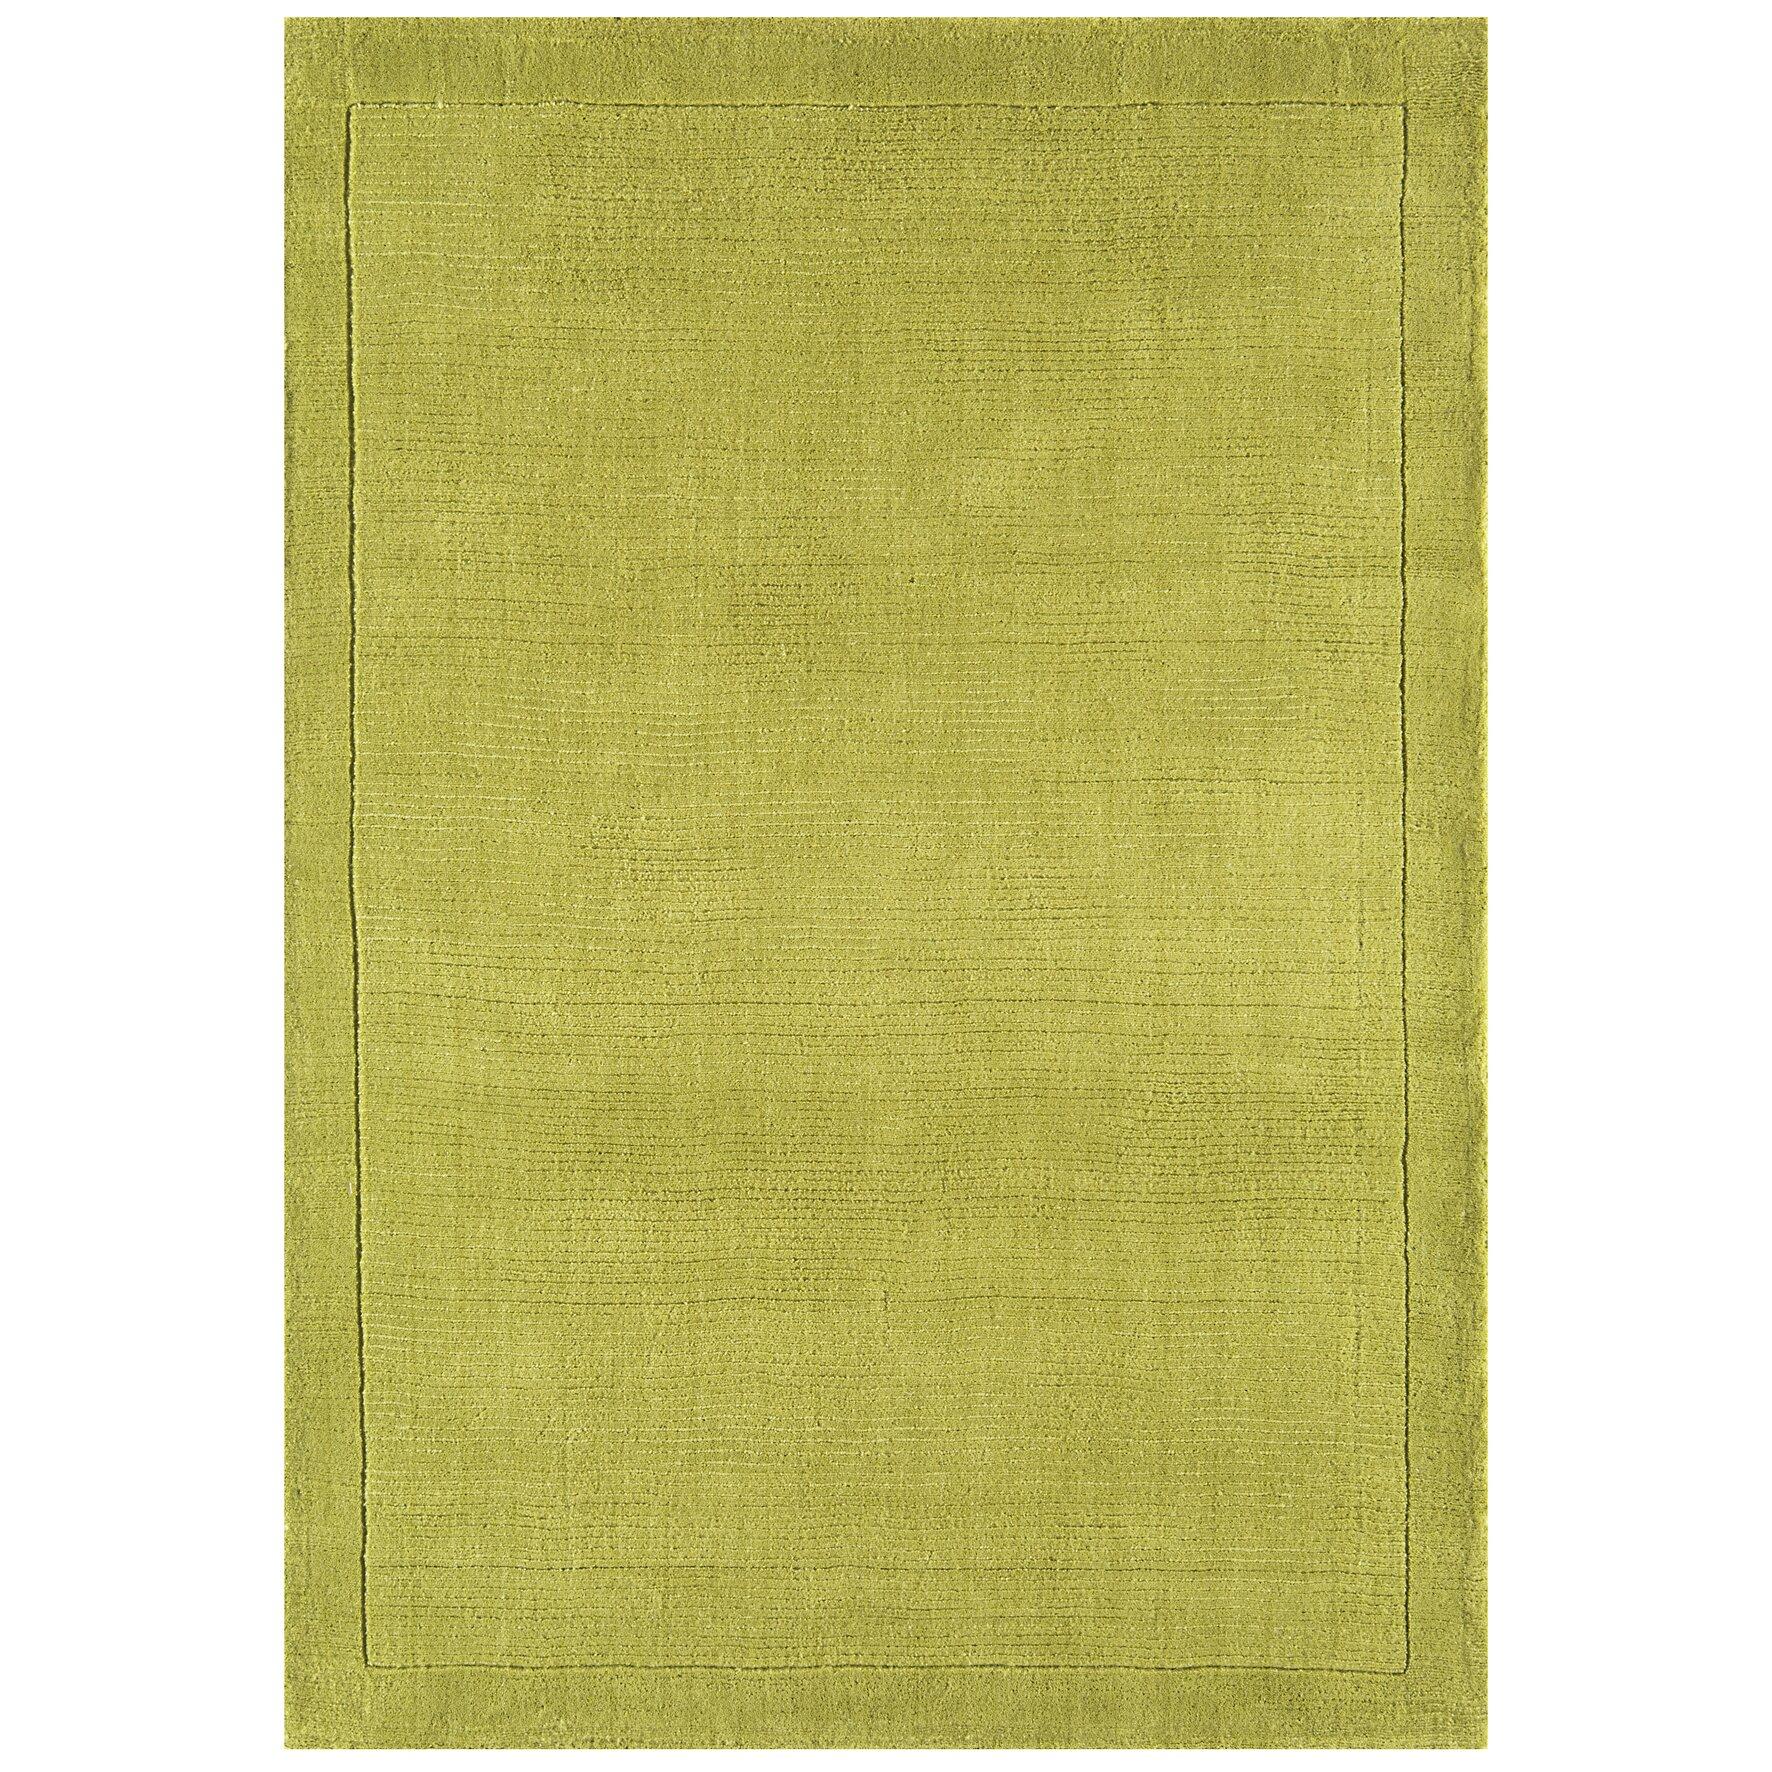 Asiatic Carpets Ltd Handgewebter Teppich York in Grün